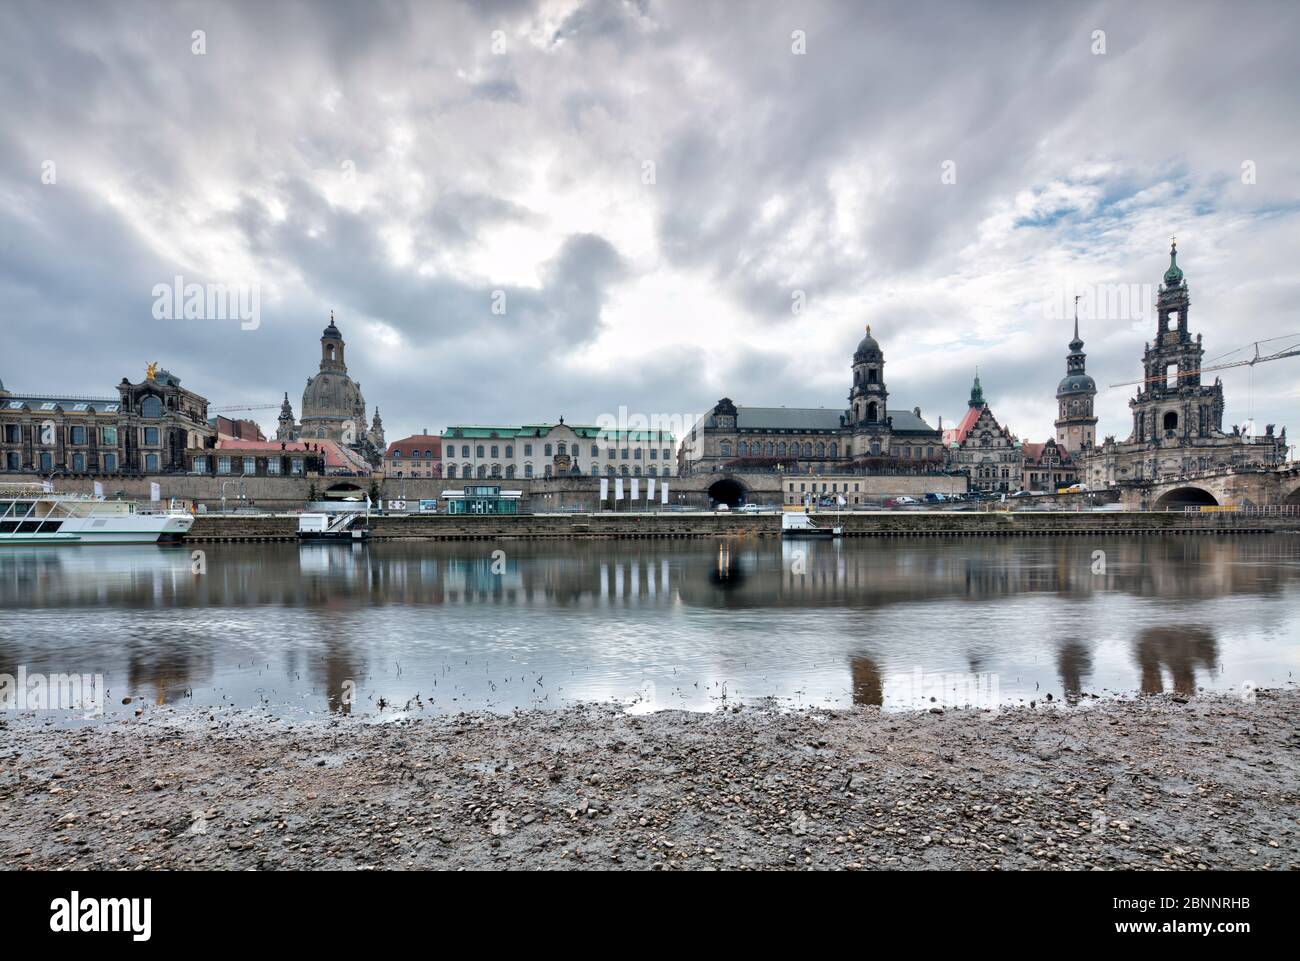 Elbe panorama, Frauenkirche, Brühlsche Terrasse, Zwinger, Hofkirche, Augustusbrücke, Dresden, Saxony, Germany, Europe, Stock Photo